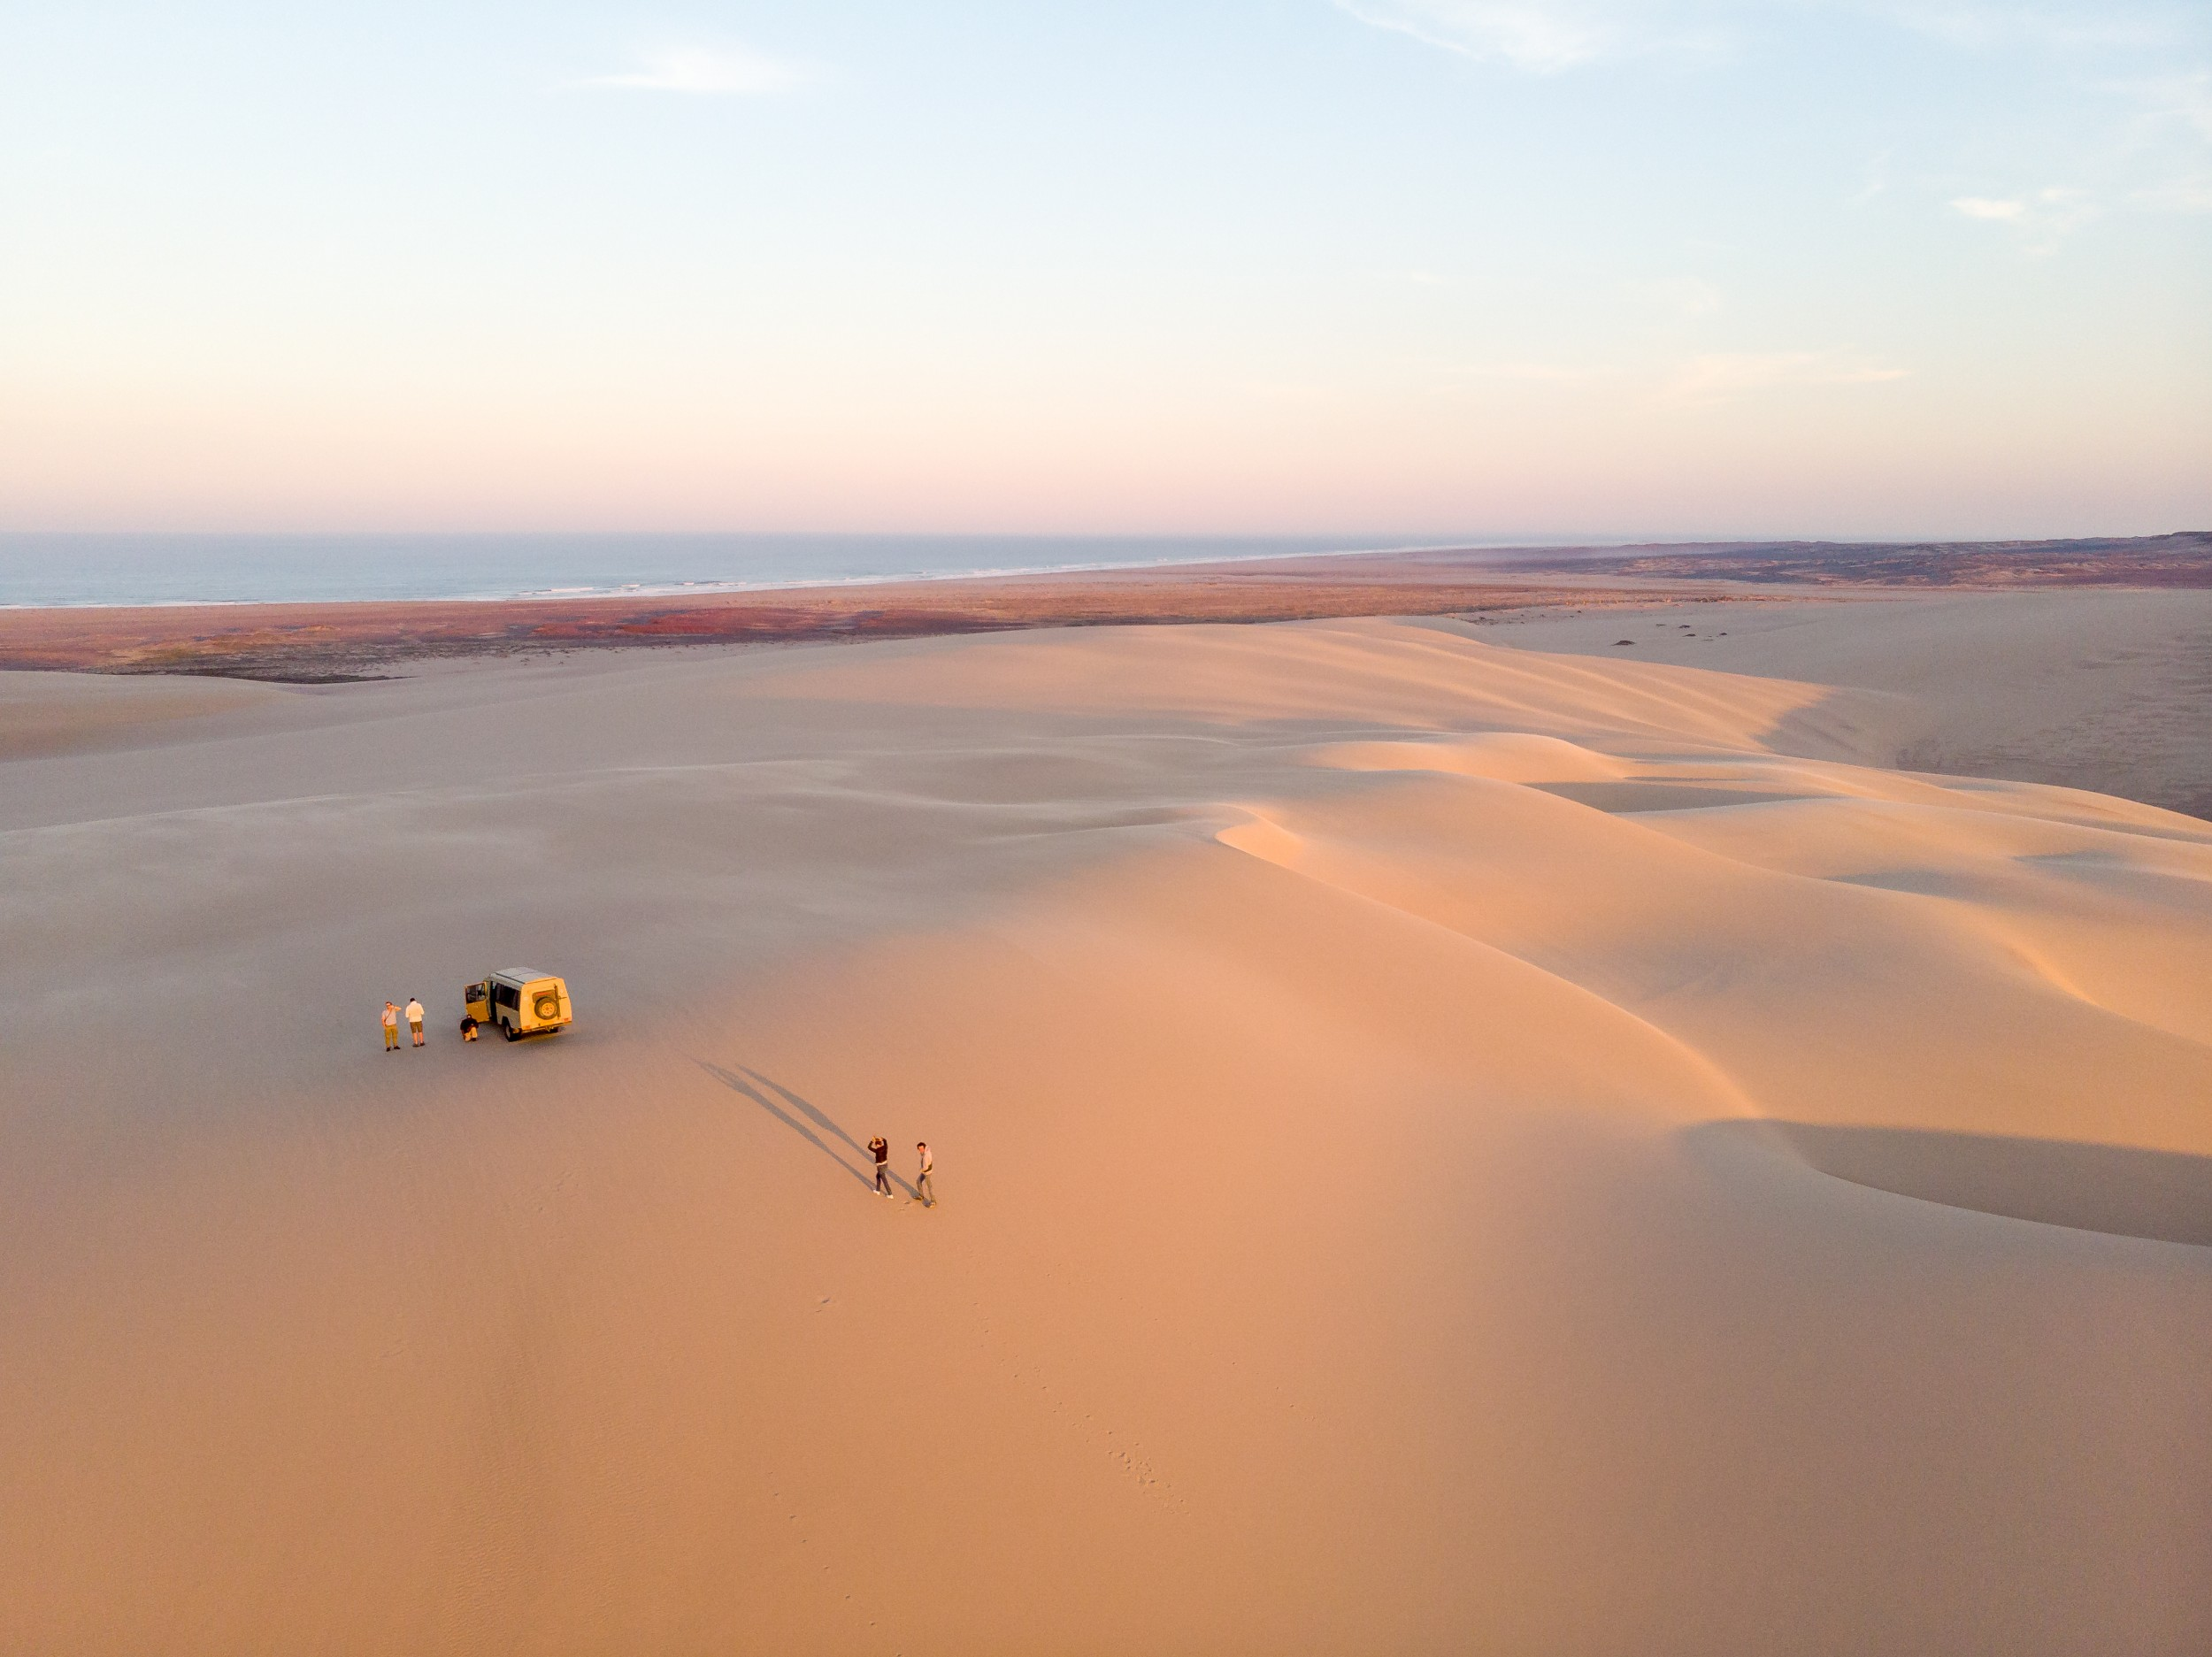 24Shipwreck Lodge - Activities - Dune exploring.jpg